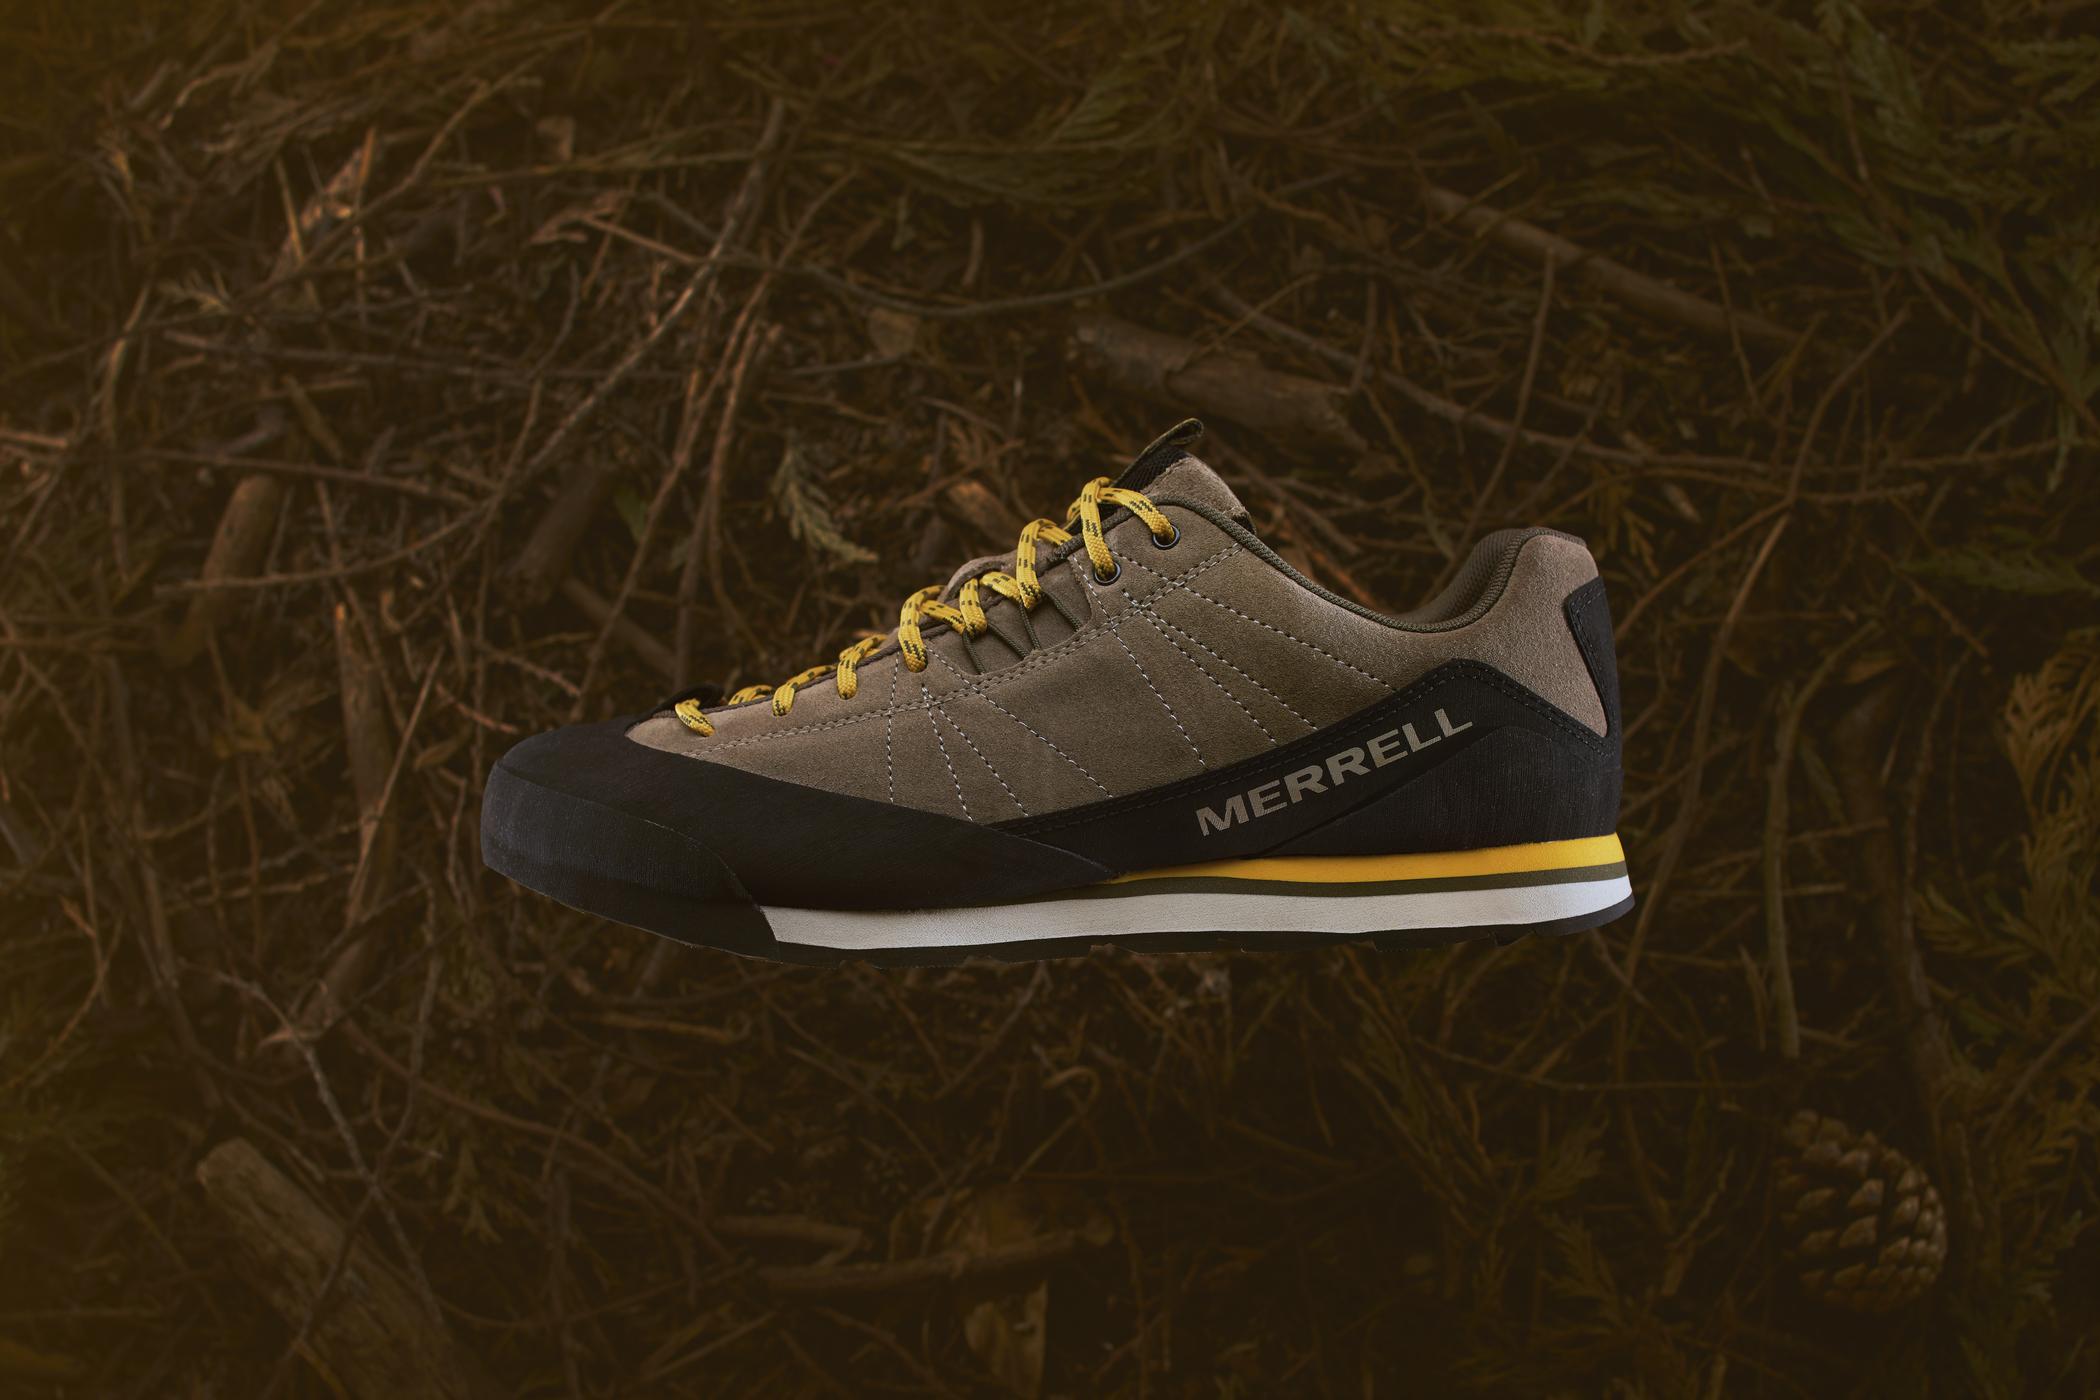 Merrell Catalyst Suede shoe. Photo by Adam Gasson / adamgasson.com